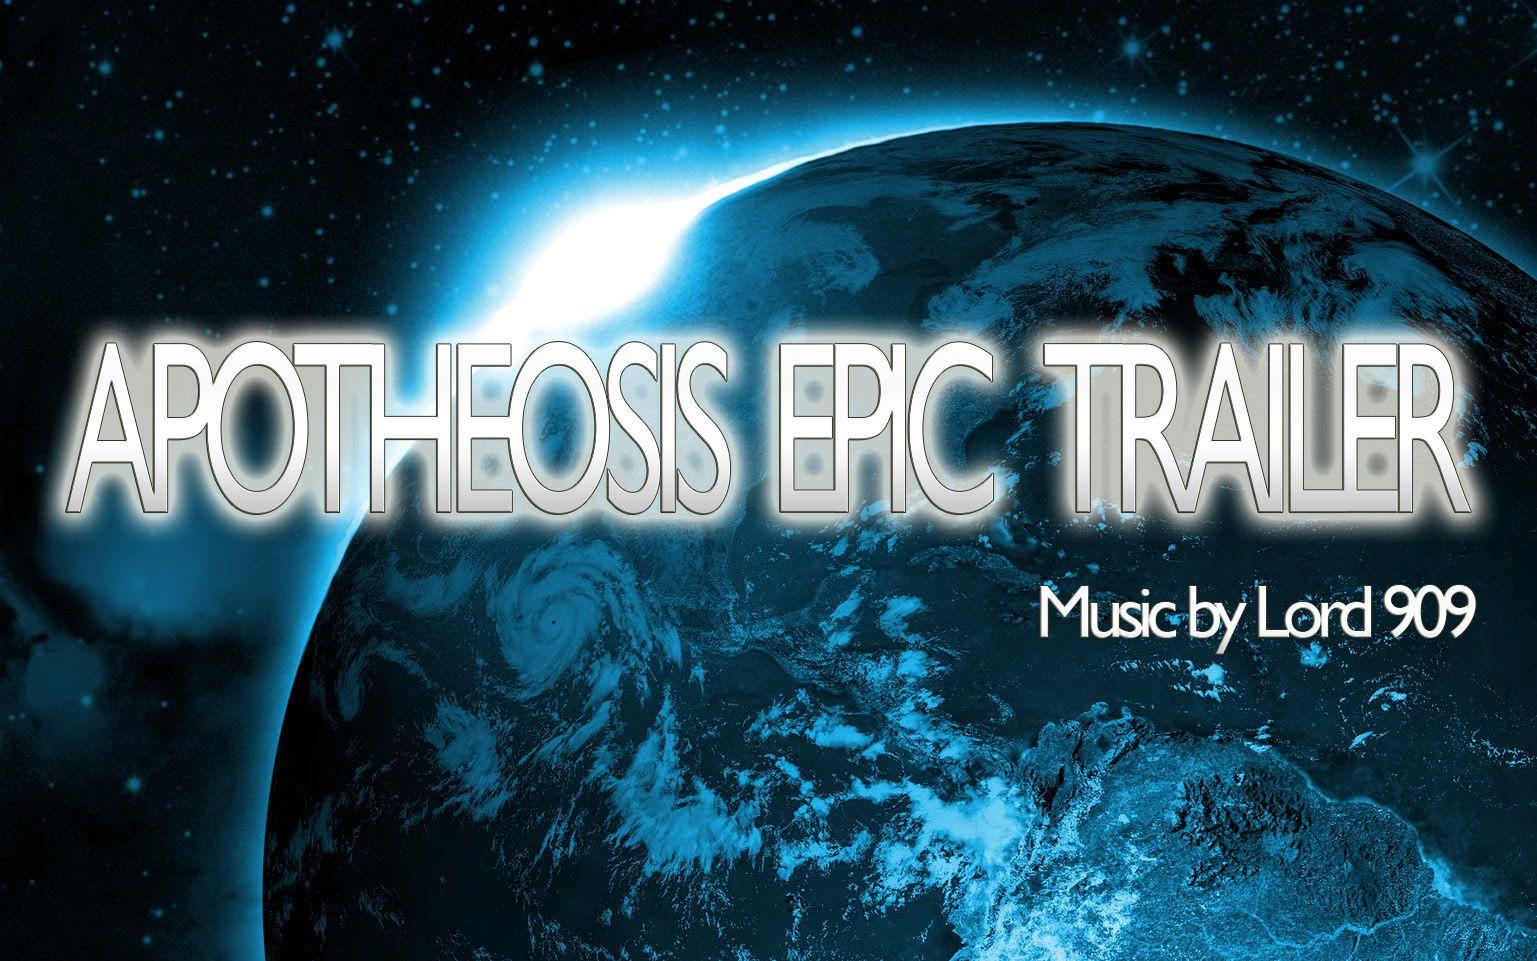 Apotheosis Epic Trailer - Lord 909